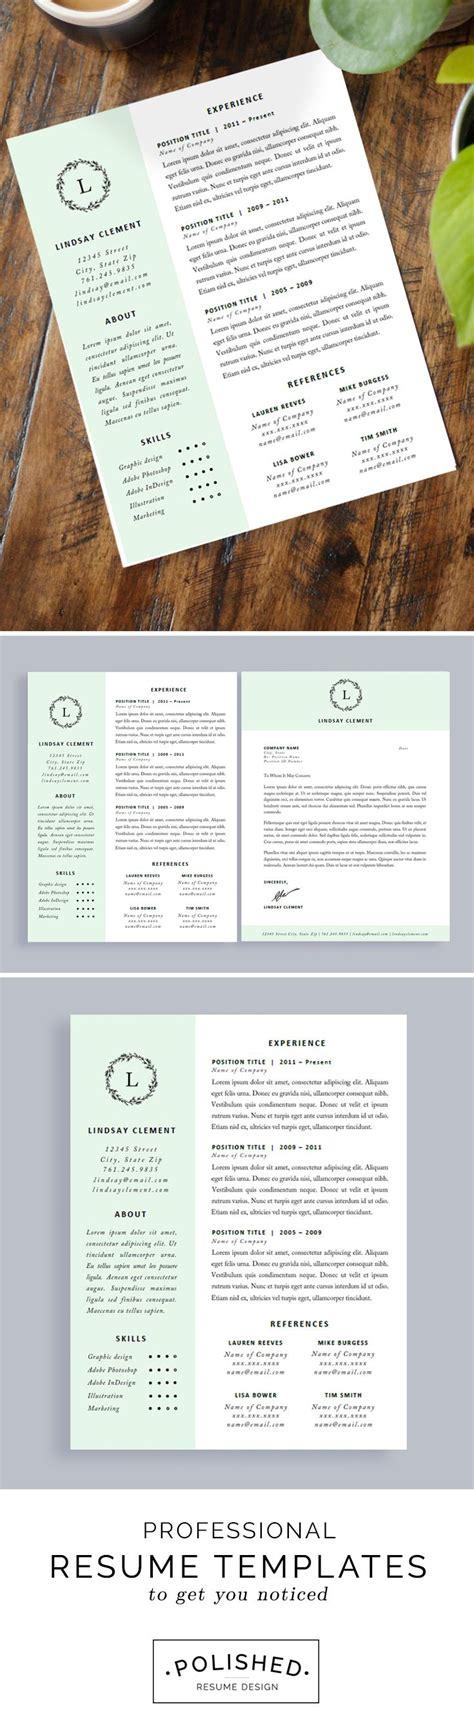 resume template sample resume word format download free career